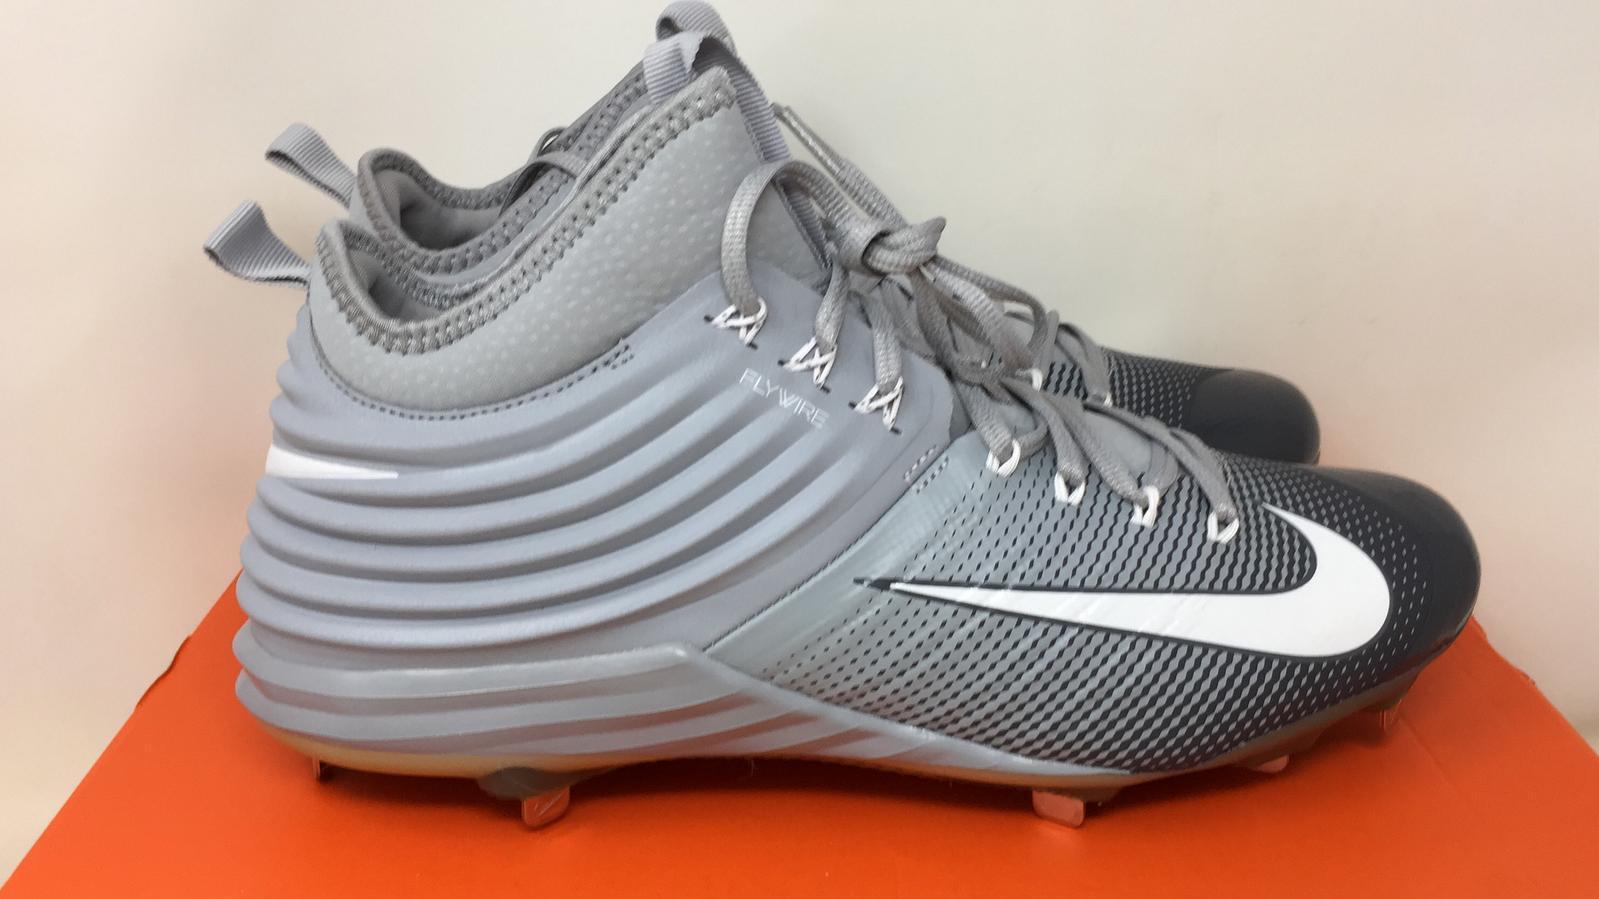 9da874c5f743 Nike Lunar Trout 2 Metal Baseball Cleats Sz 11.5 Wolf Grey White ...